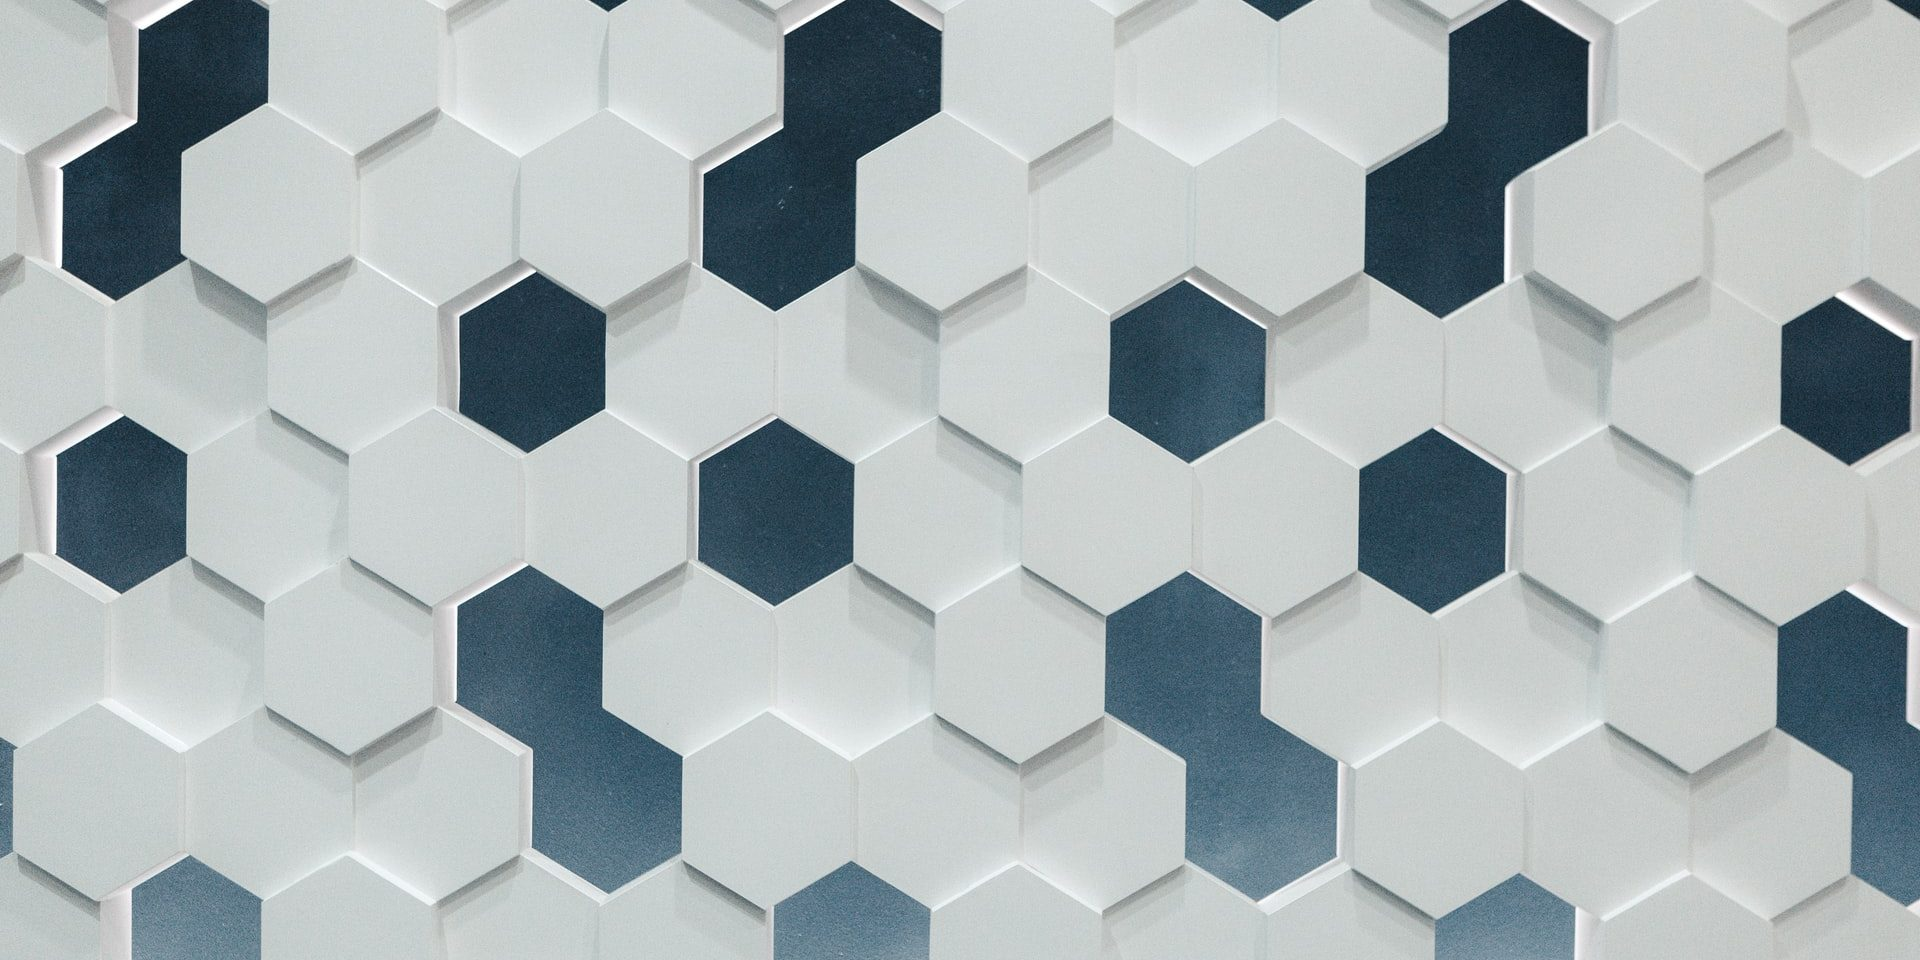 White and black Hexagon